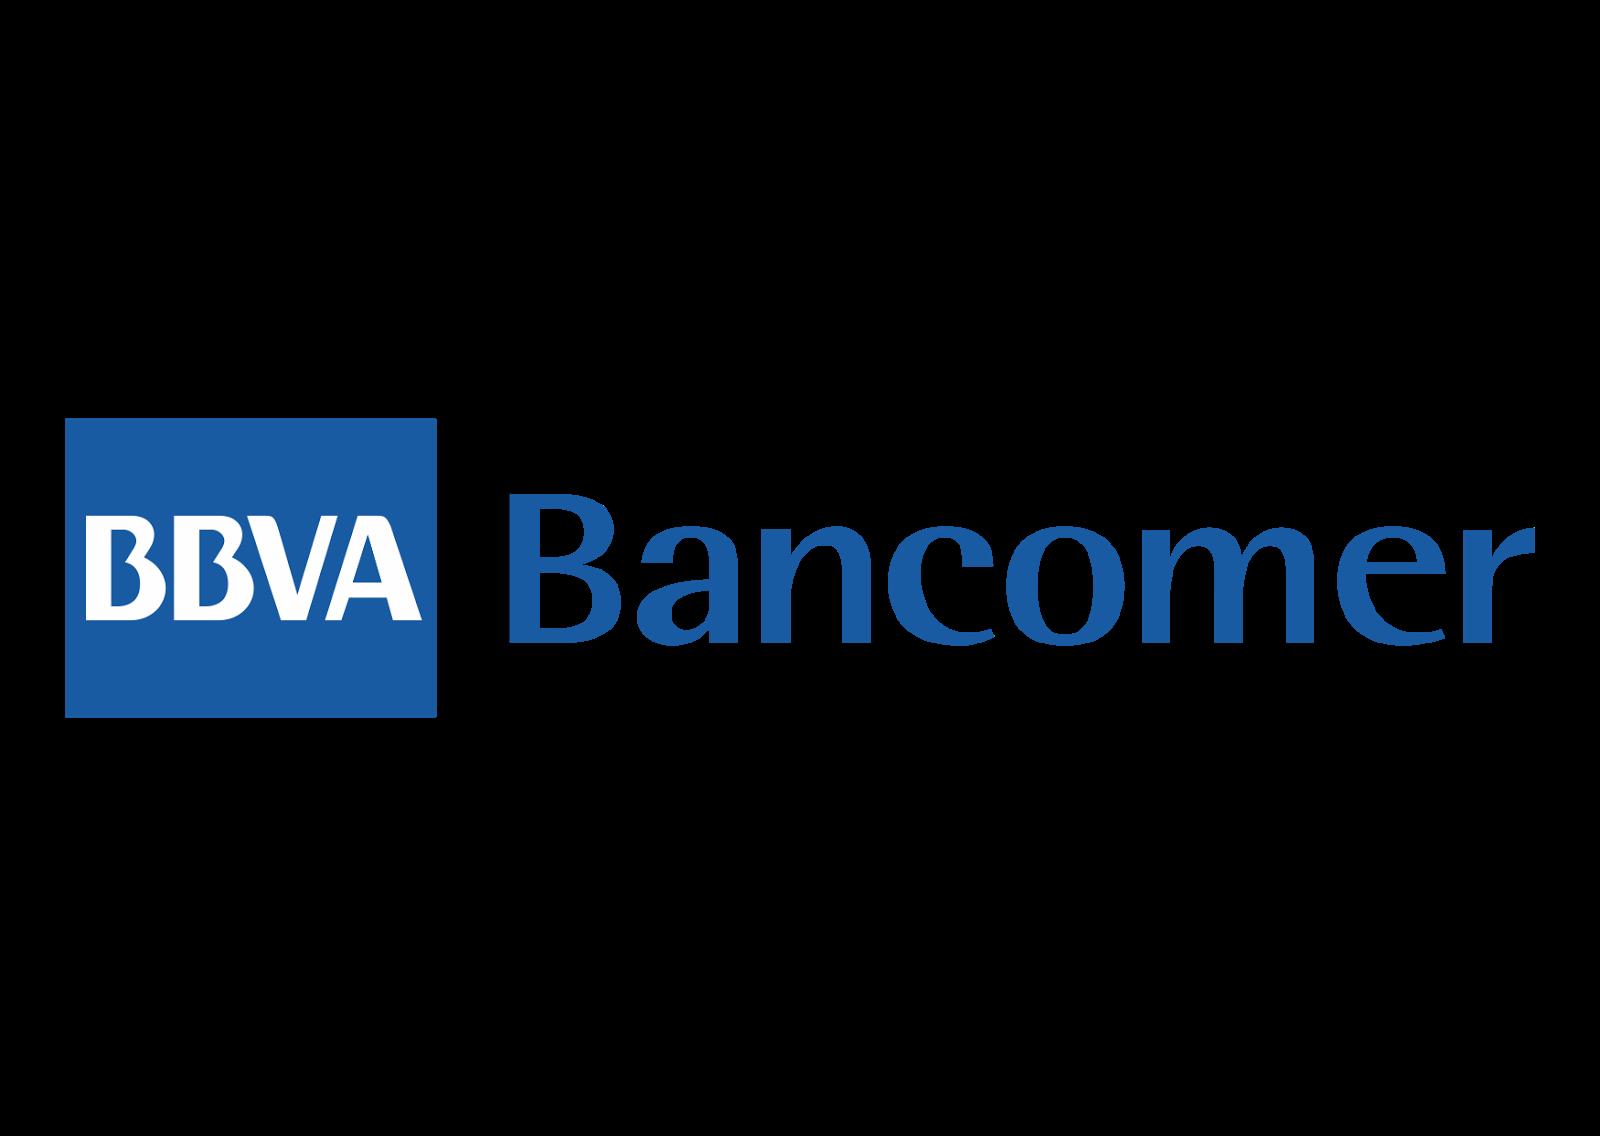 BBVA Bancomer Logo Vector (Banking Company)~ Format Cdr